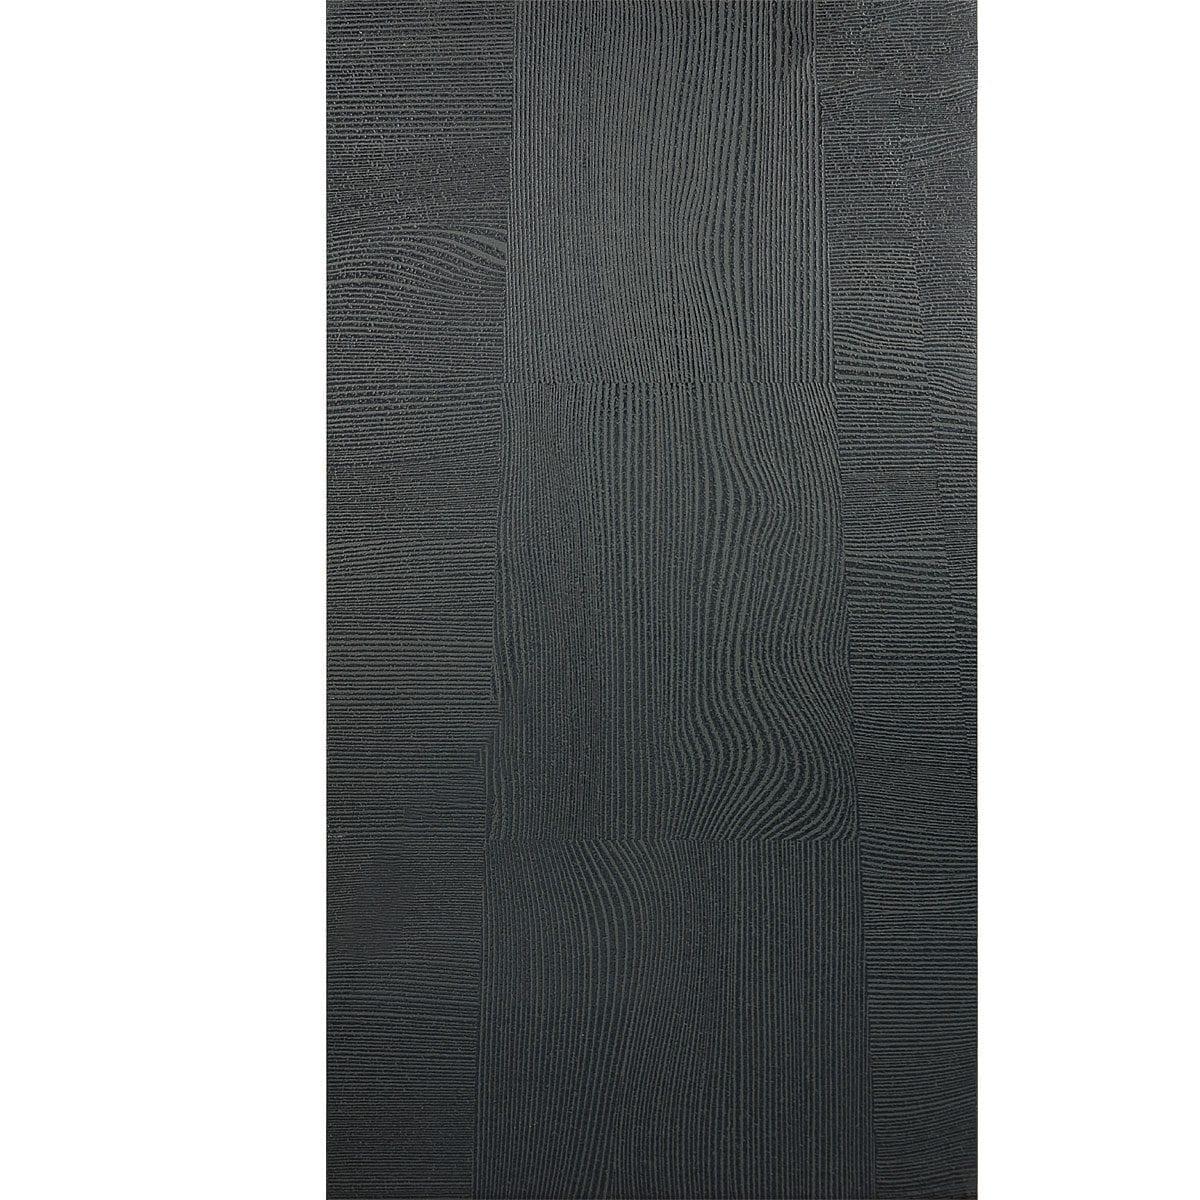 WOODGRAIN BLACK T10435 P1